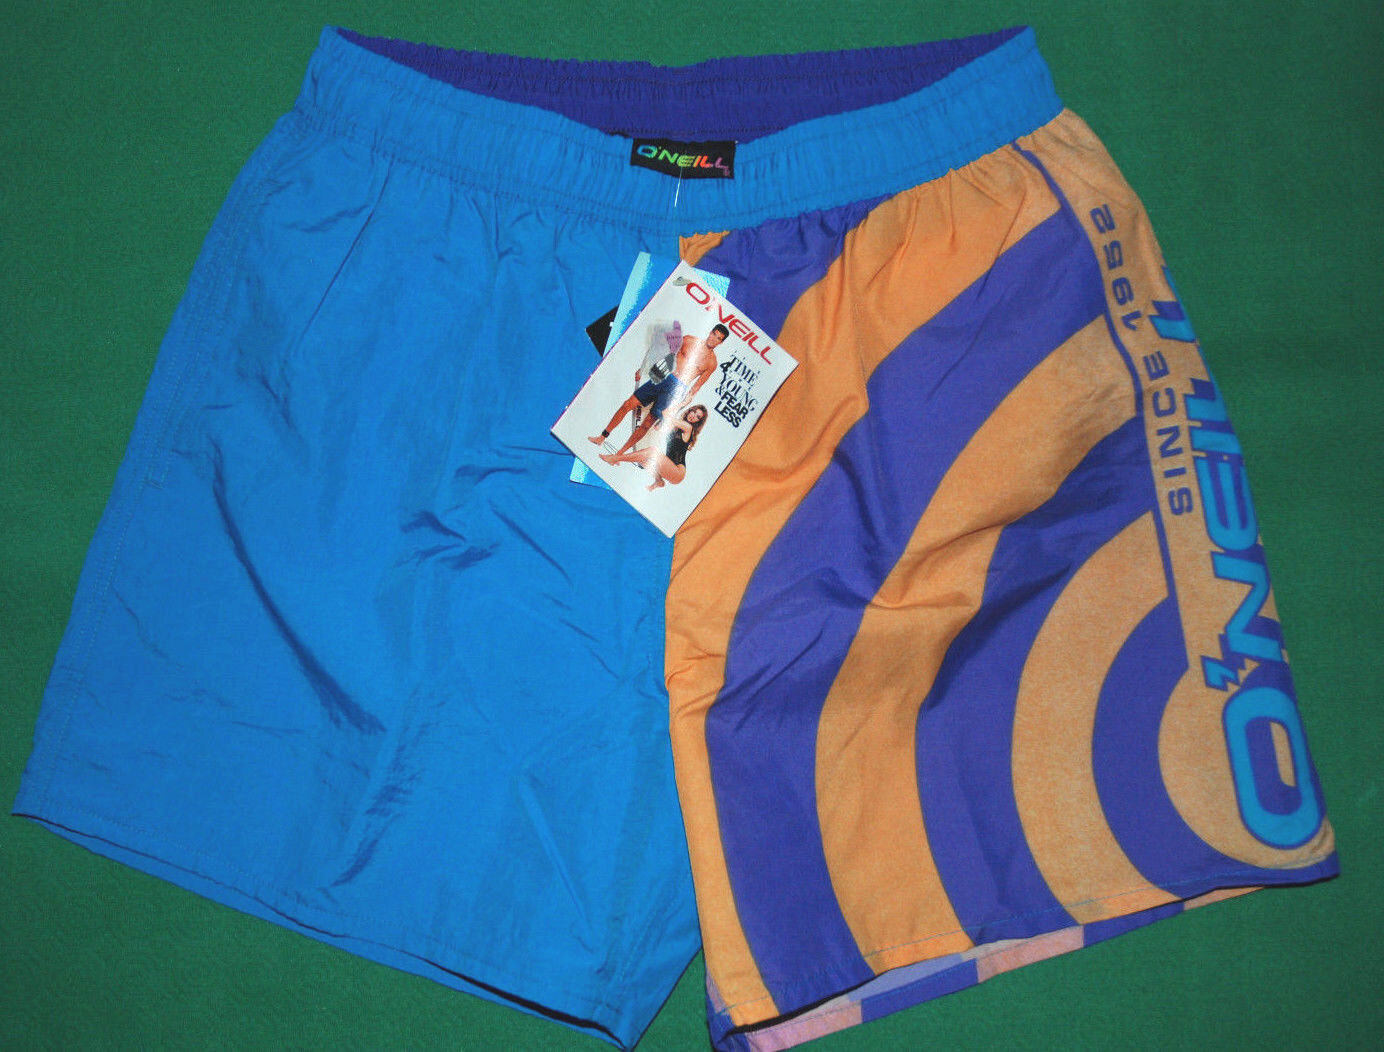 Vintage O'NEILL 90s santa cruz swimwear swim costume sea boardshorts mint